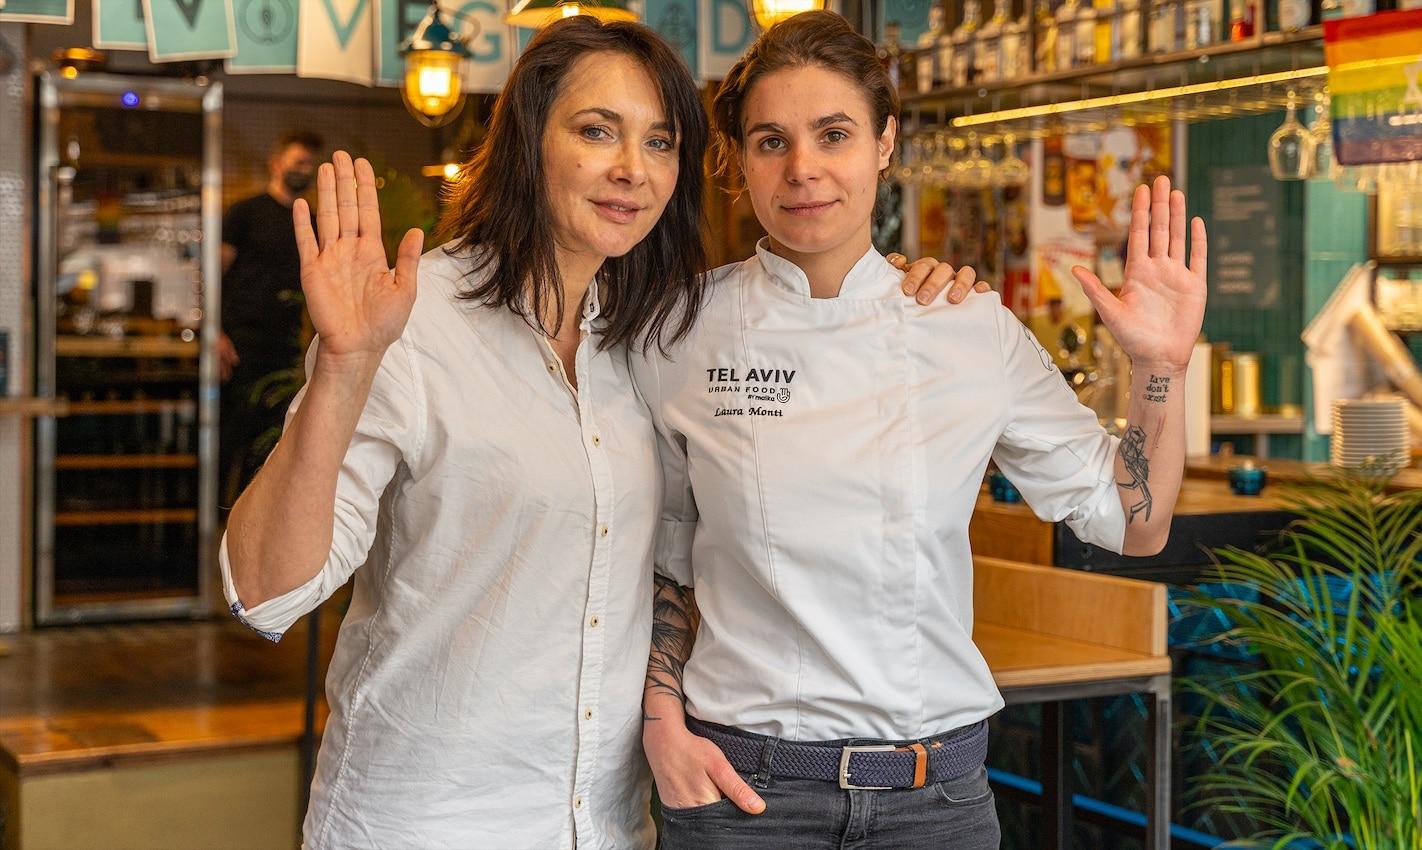 Malka Kafka_właścicielka i Laura Monti_szefowa kuchni - TelAviv Urban Food